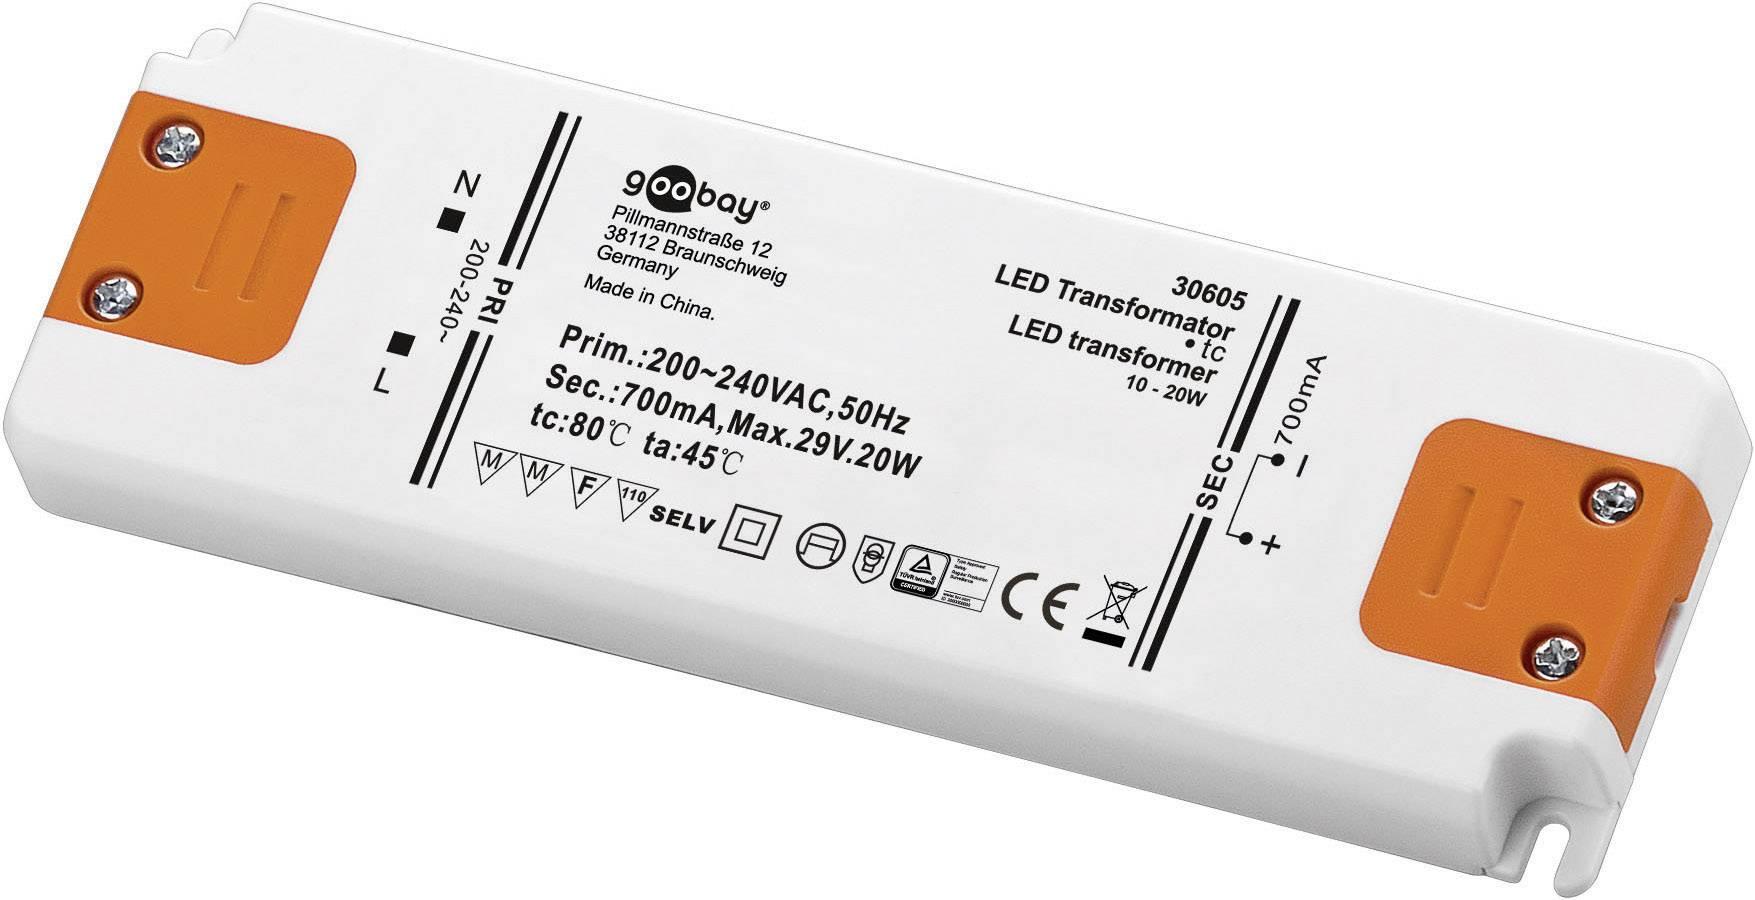 Vstavateľný LED driver Goobay SET CC 700-20 LED, 20 W (max), 0.7 A, 0 - 29 V/DC